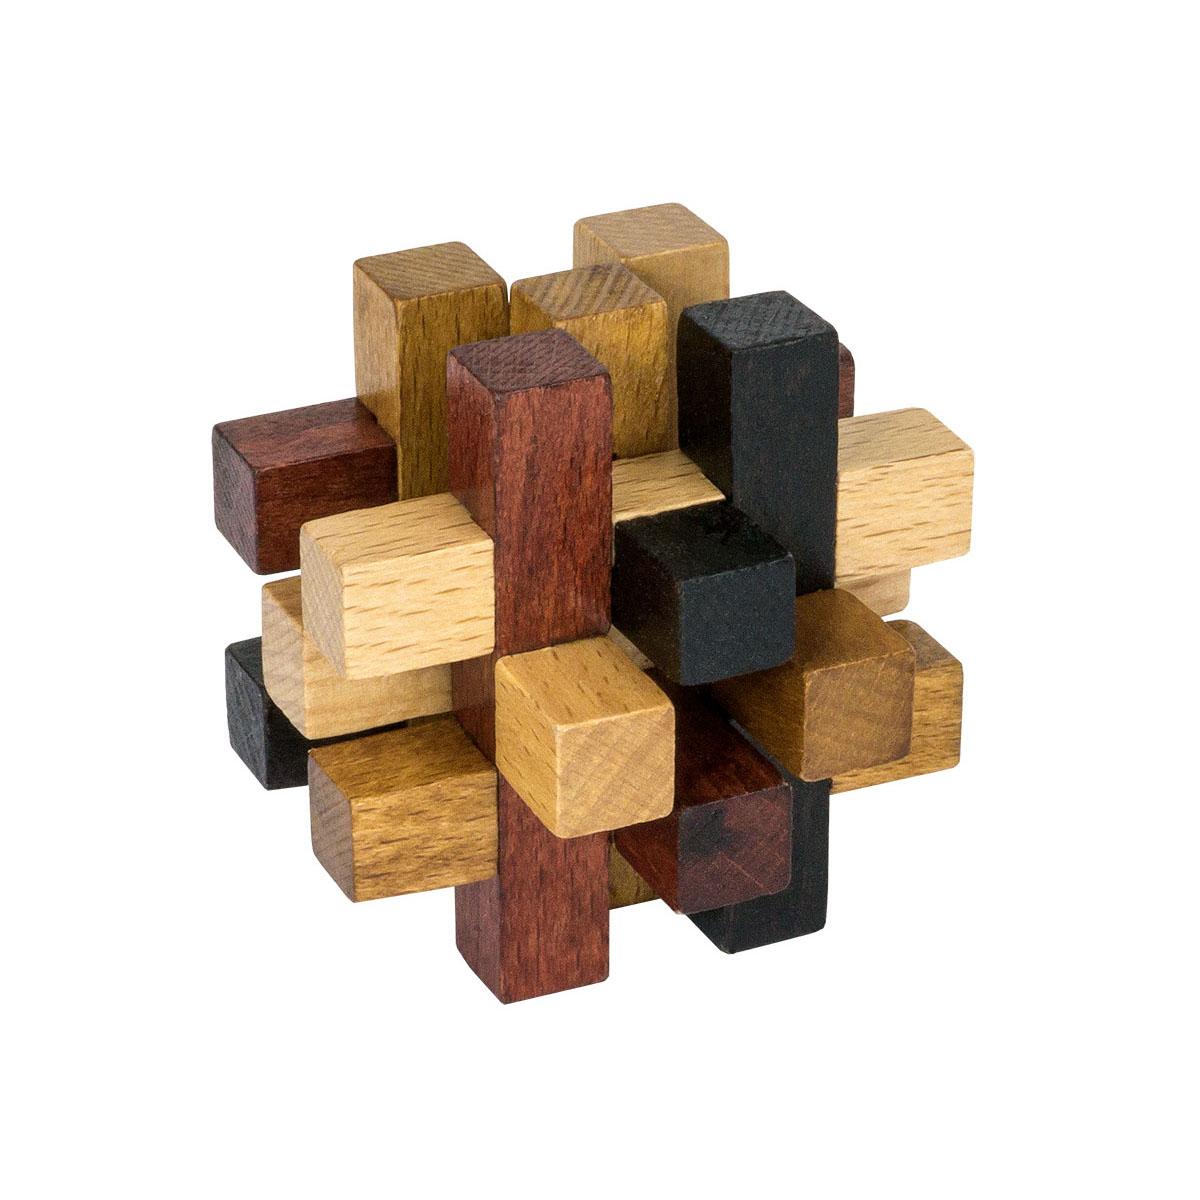 PuzzleAcademyNEW (2 of 7)